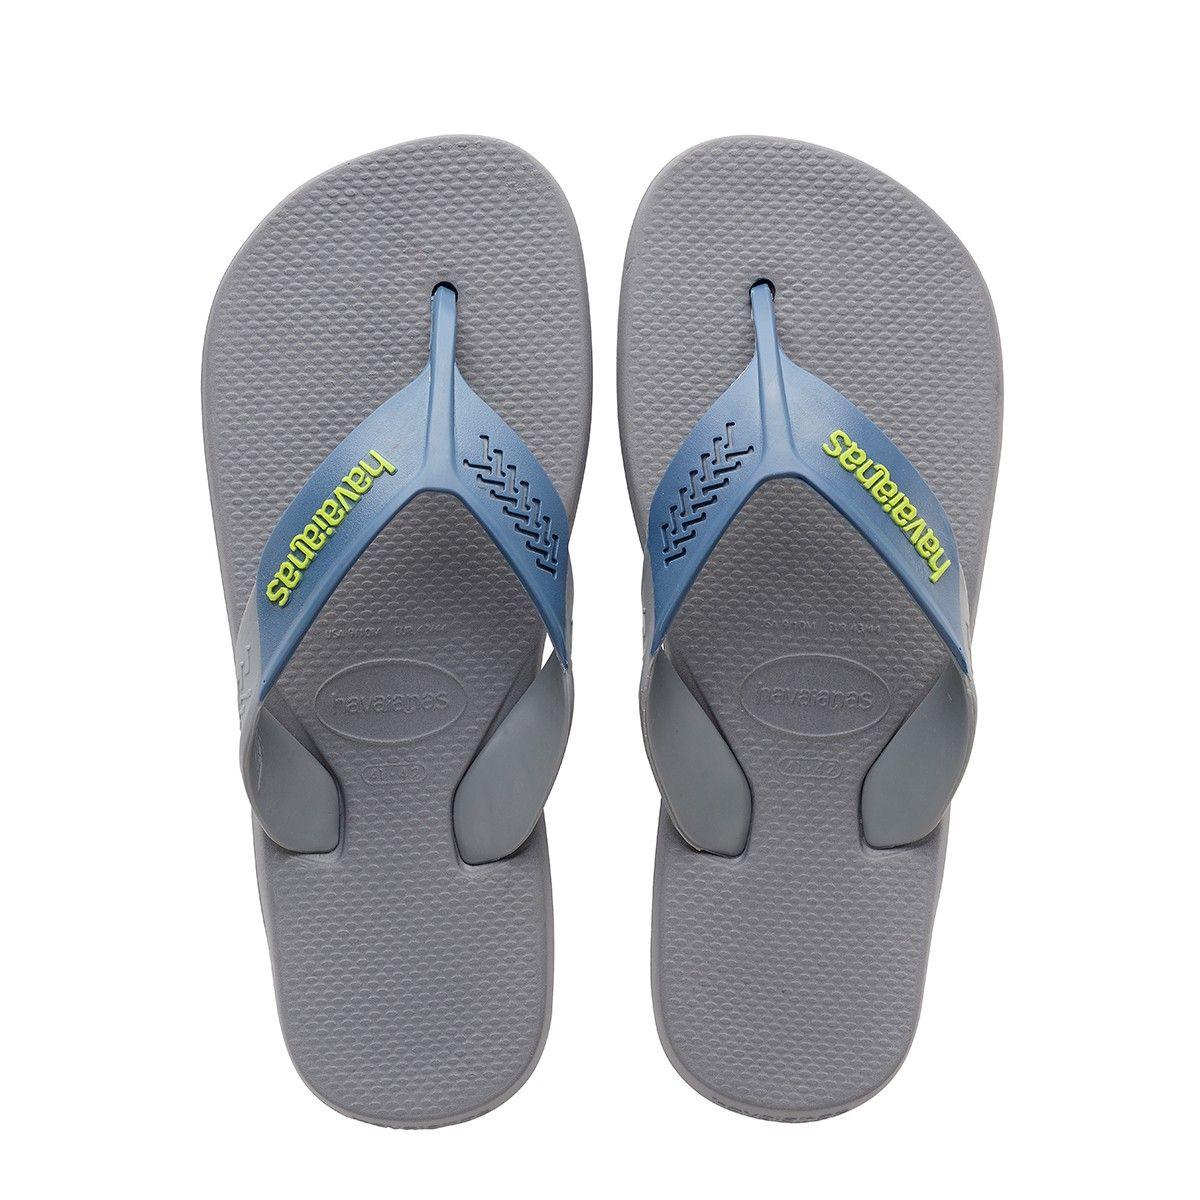 Havaianas Dynamic Sandal Steel Grey Indigo Blue In Dynamic Sandal Steel Grey Indigo Blue Modesens Mens Flip Flops Rubber Flip Flops Havaianas